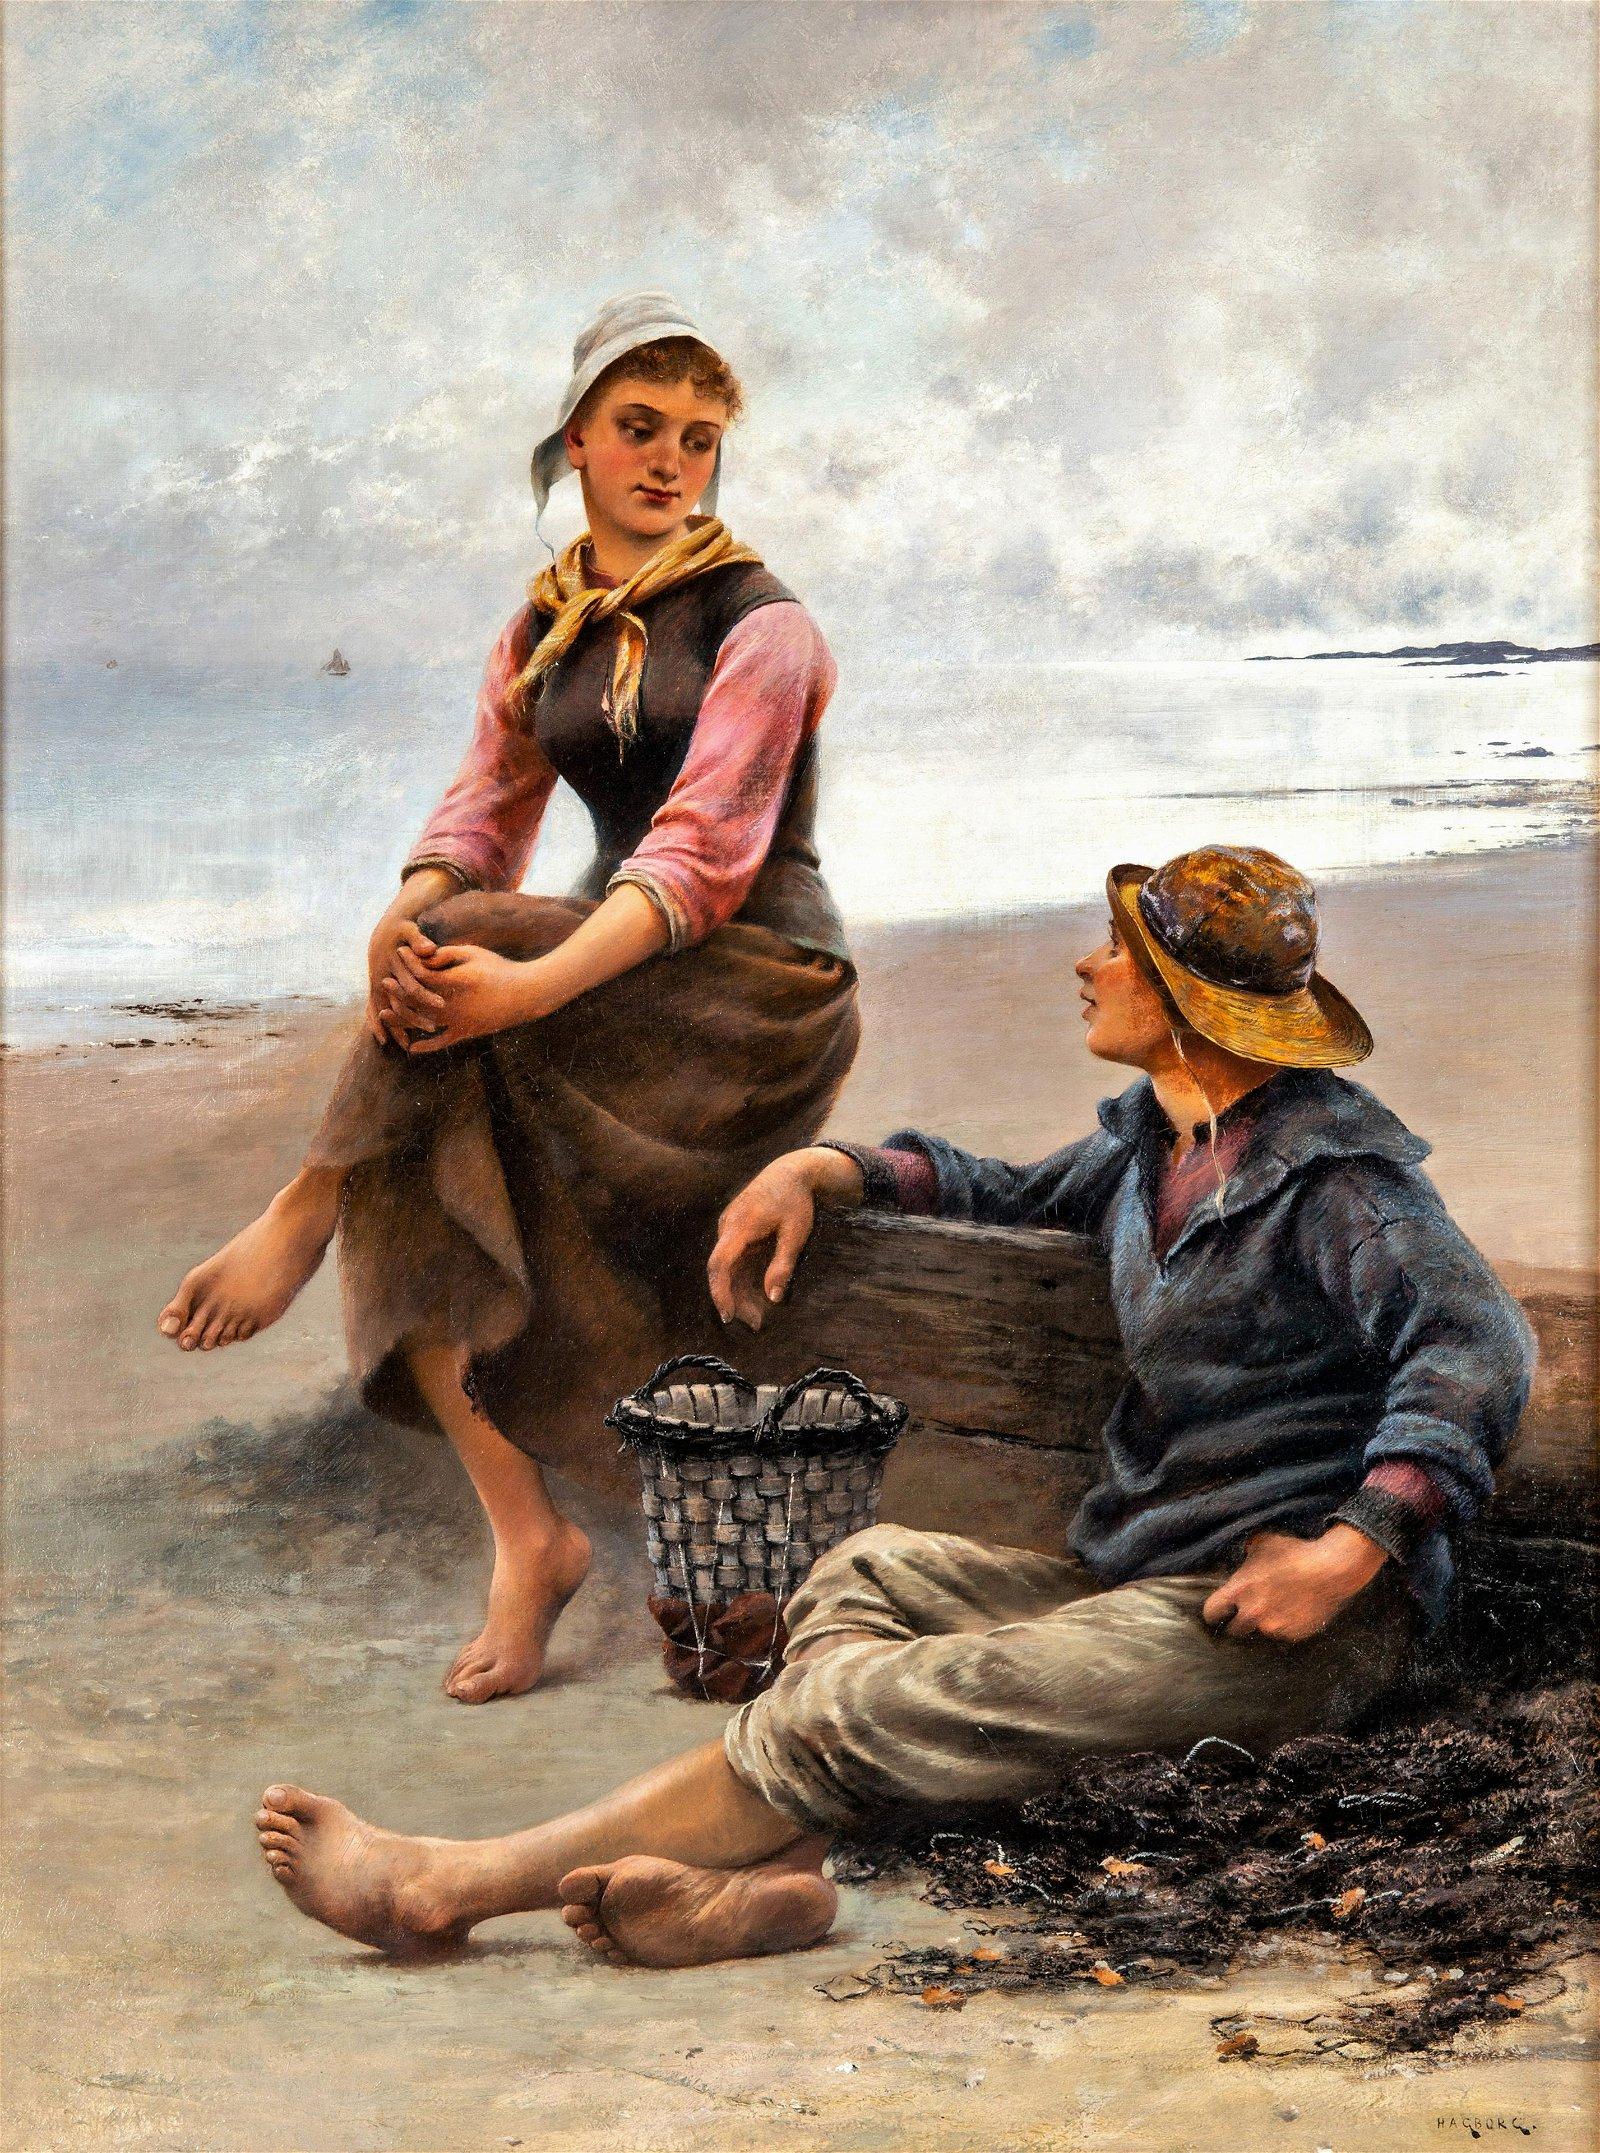 AUGUST HAGBORG (SWEDISH 1852-1921)